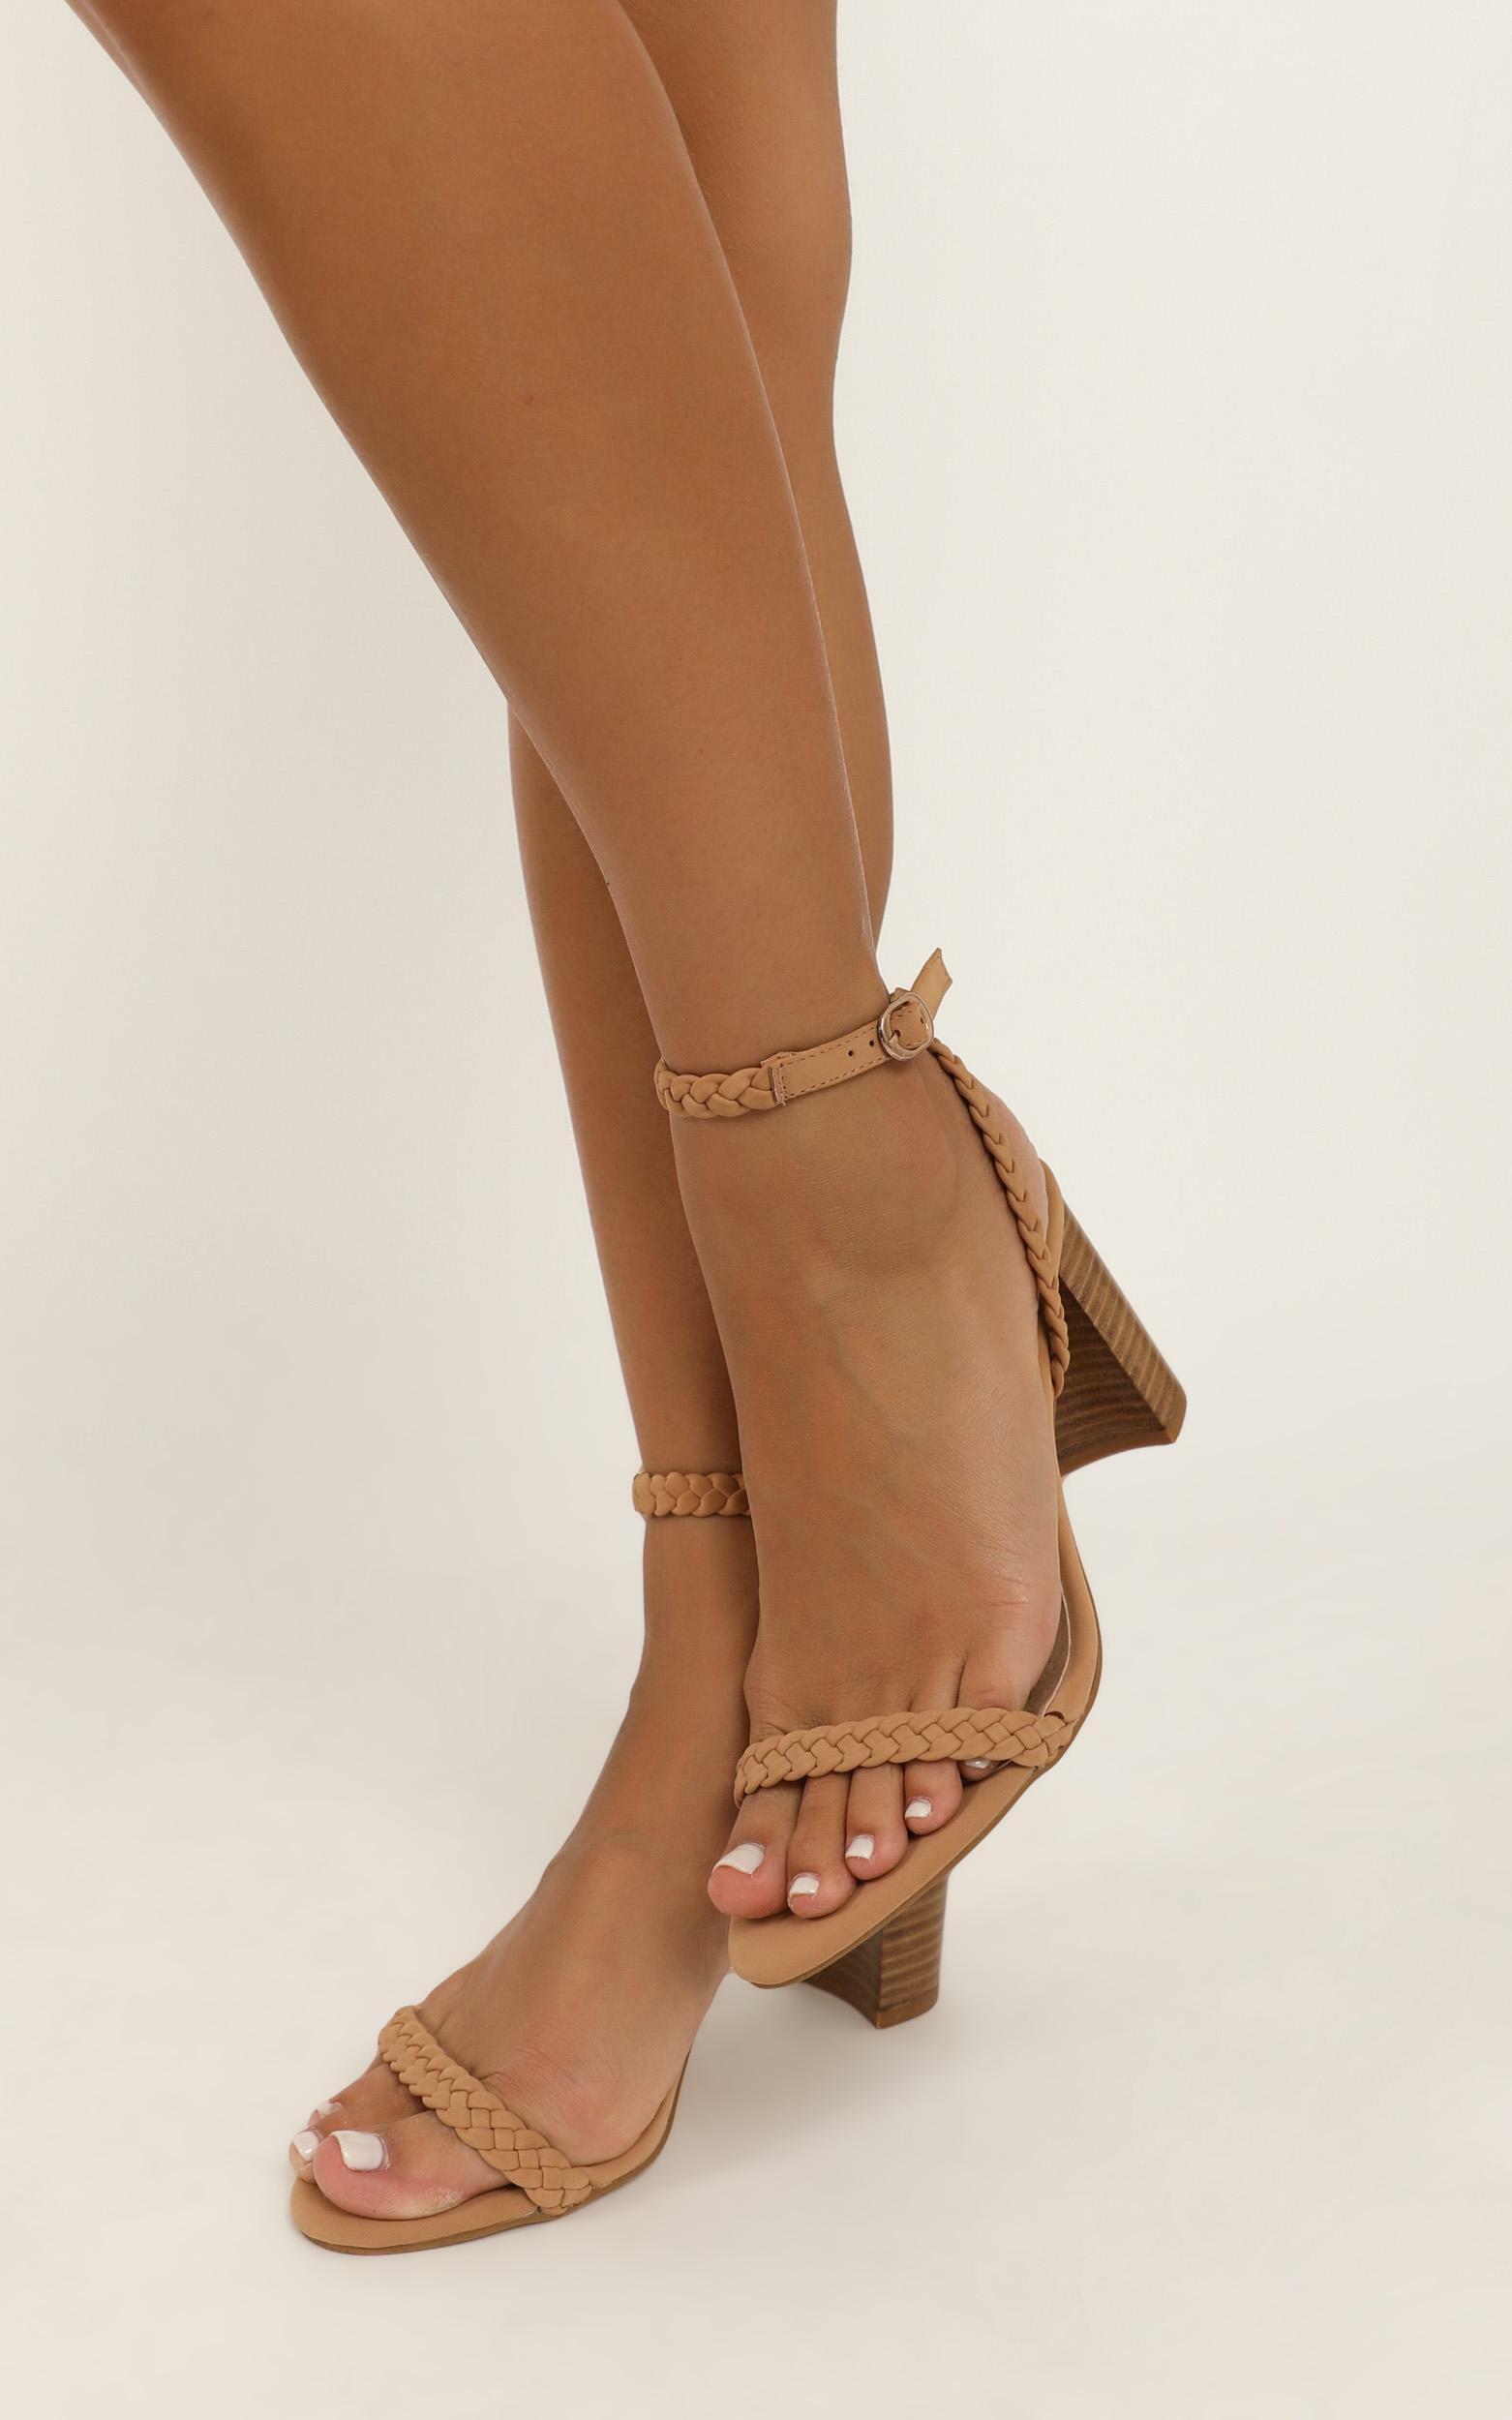 Billini - Rita heels in camel nubuck - 10, Camel, hi-res image number null